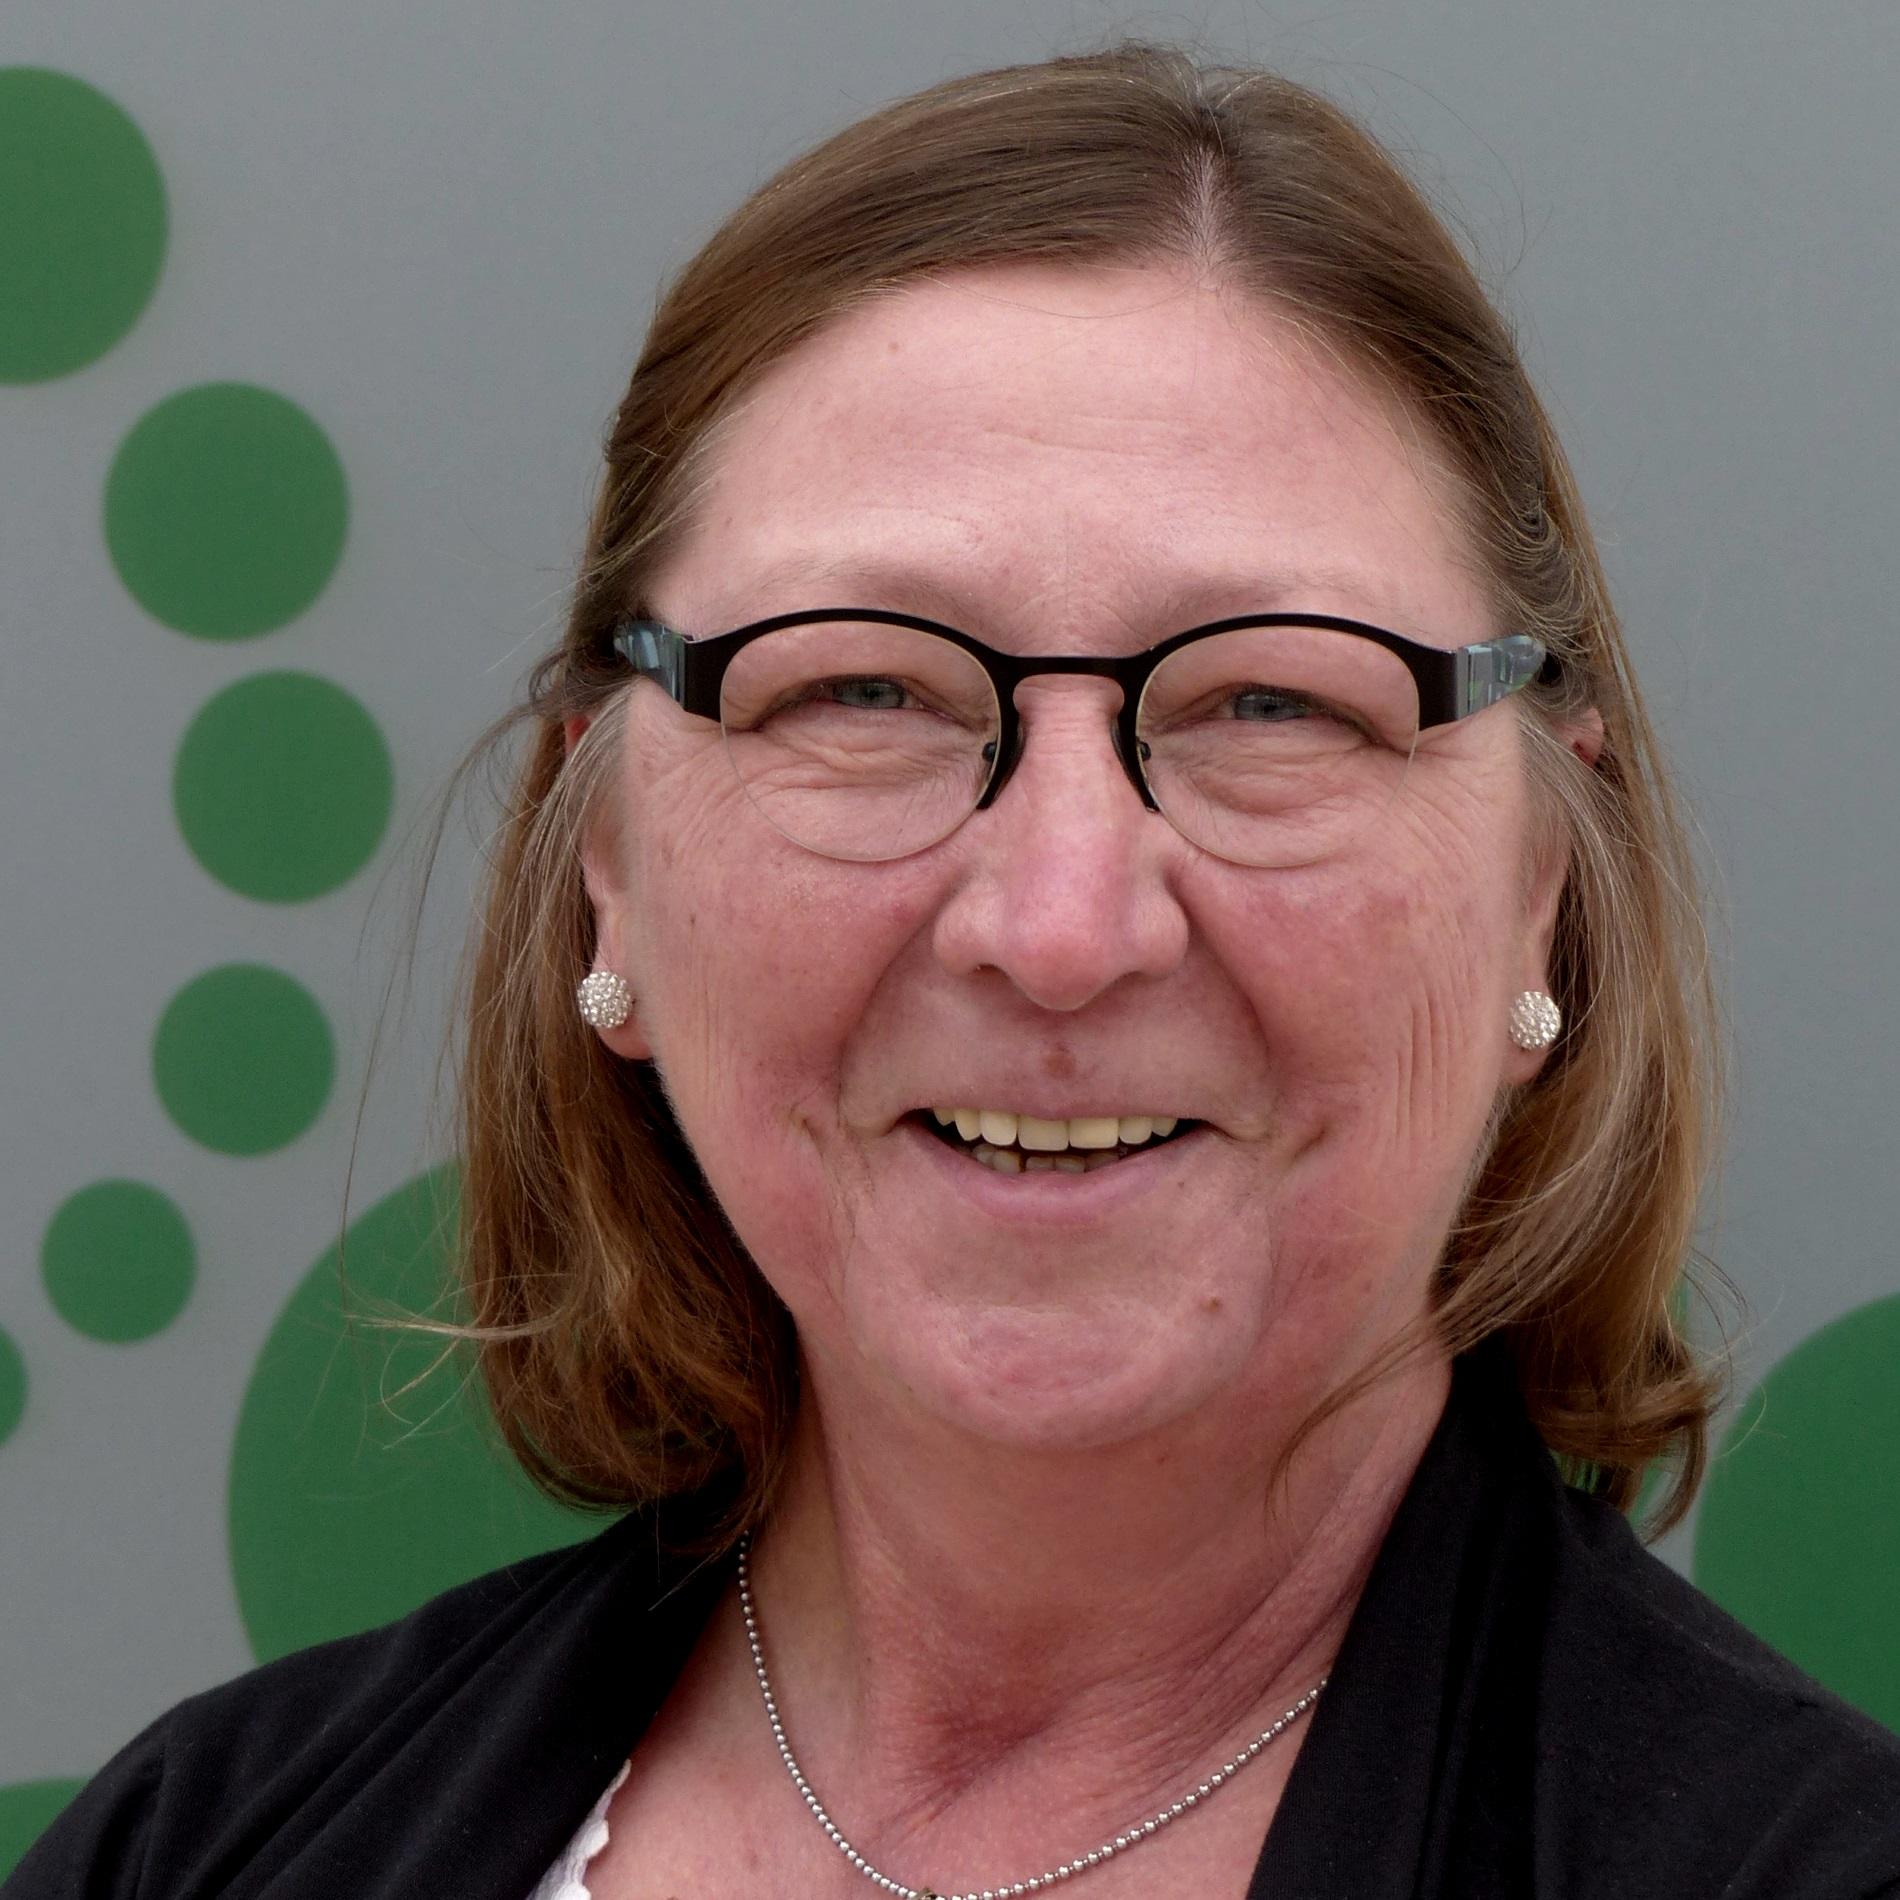 Petra Roth